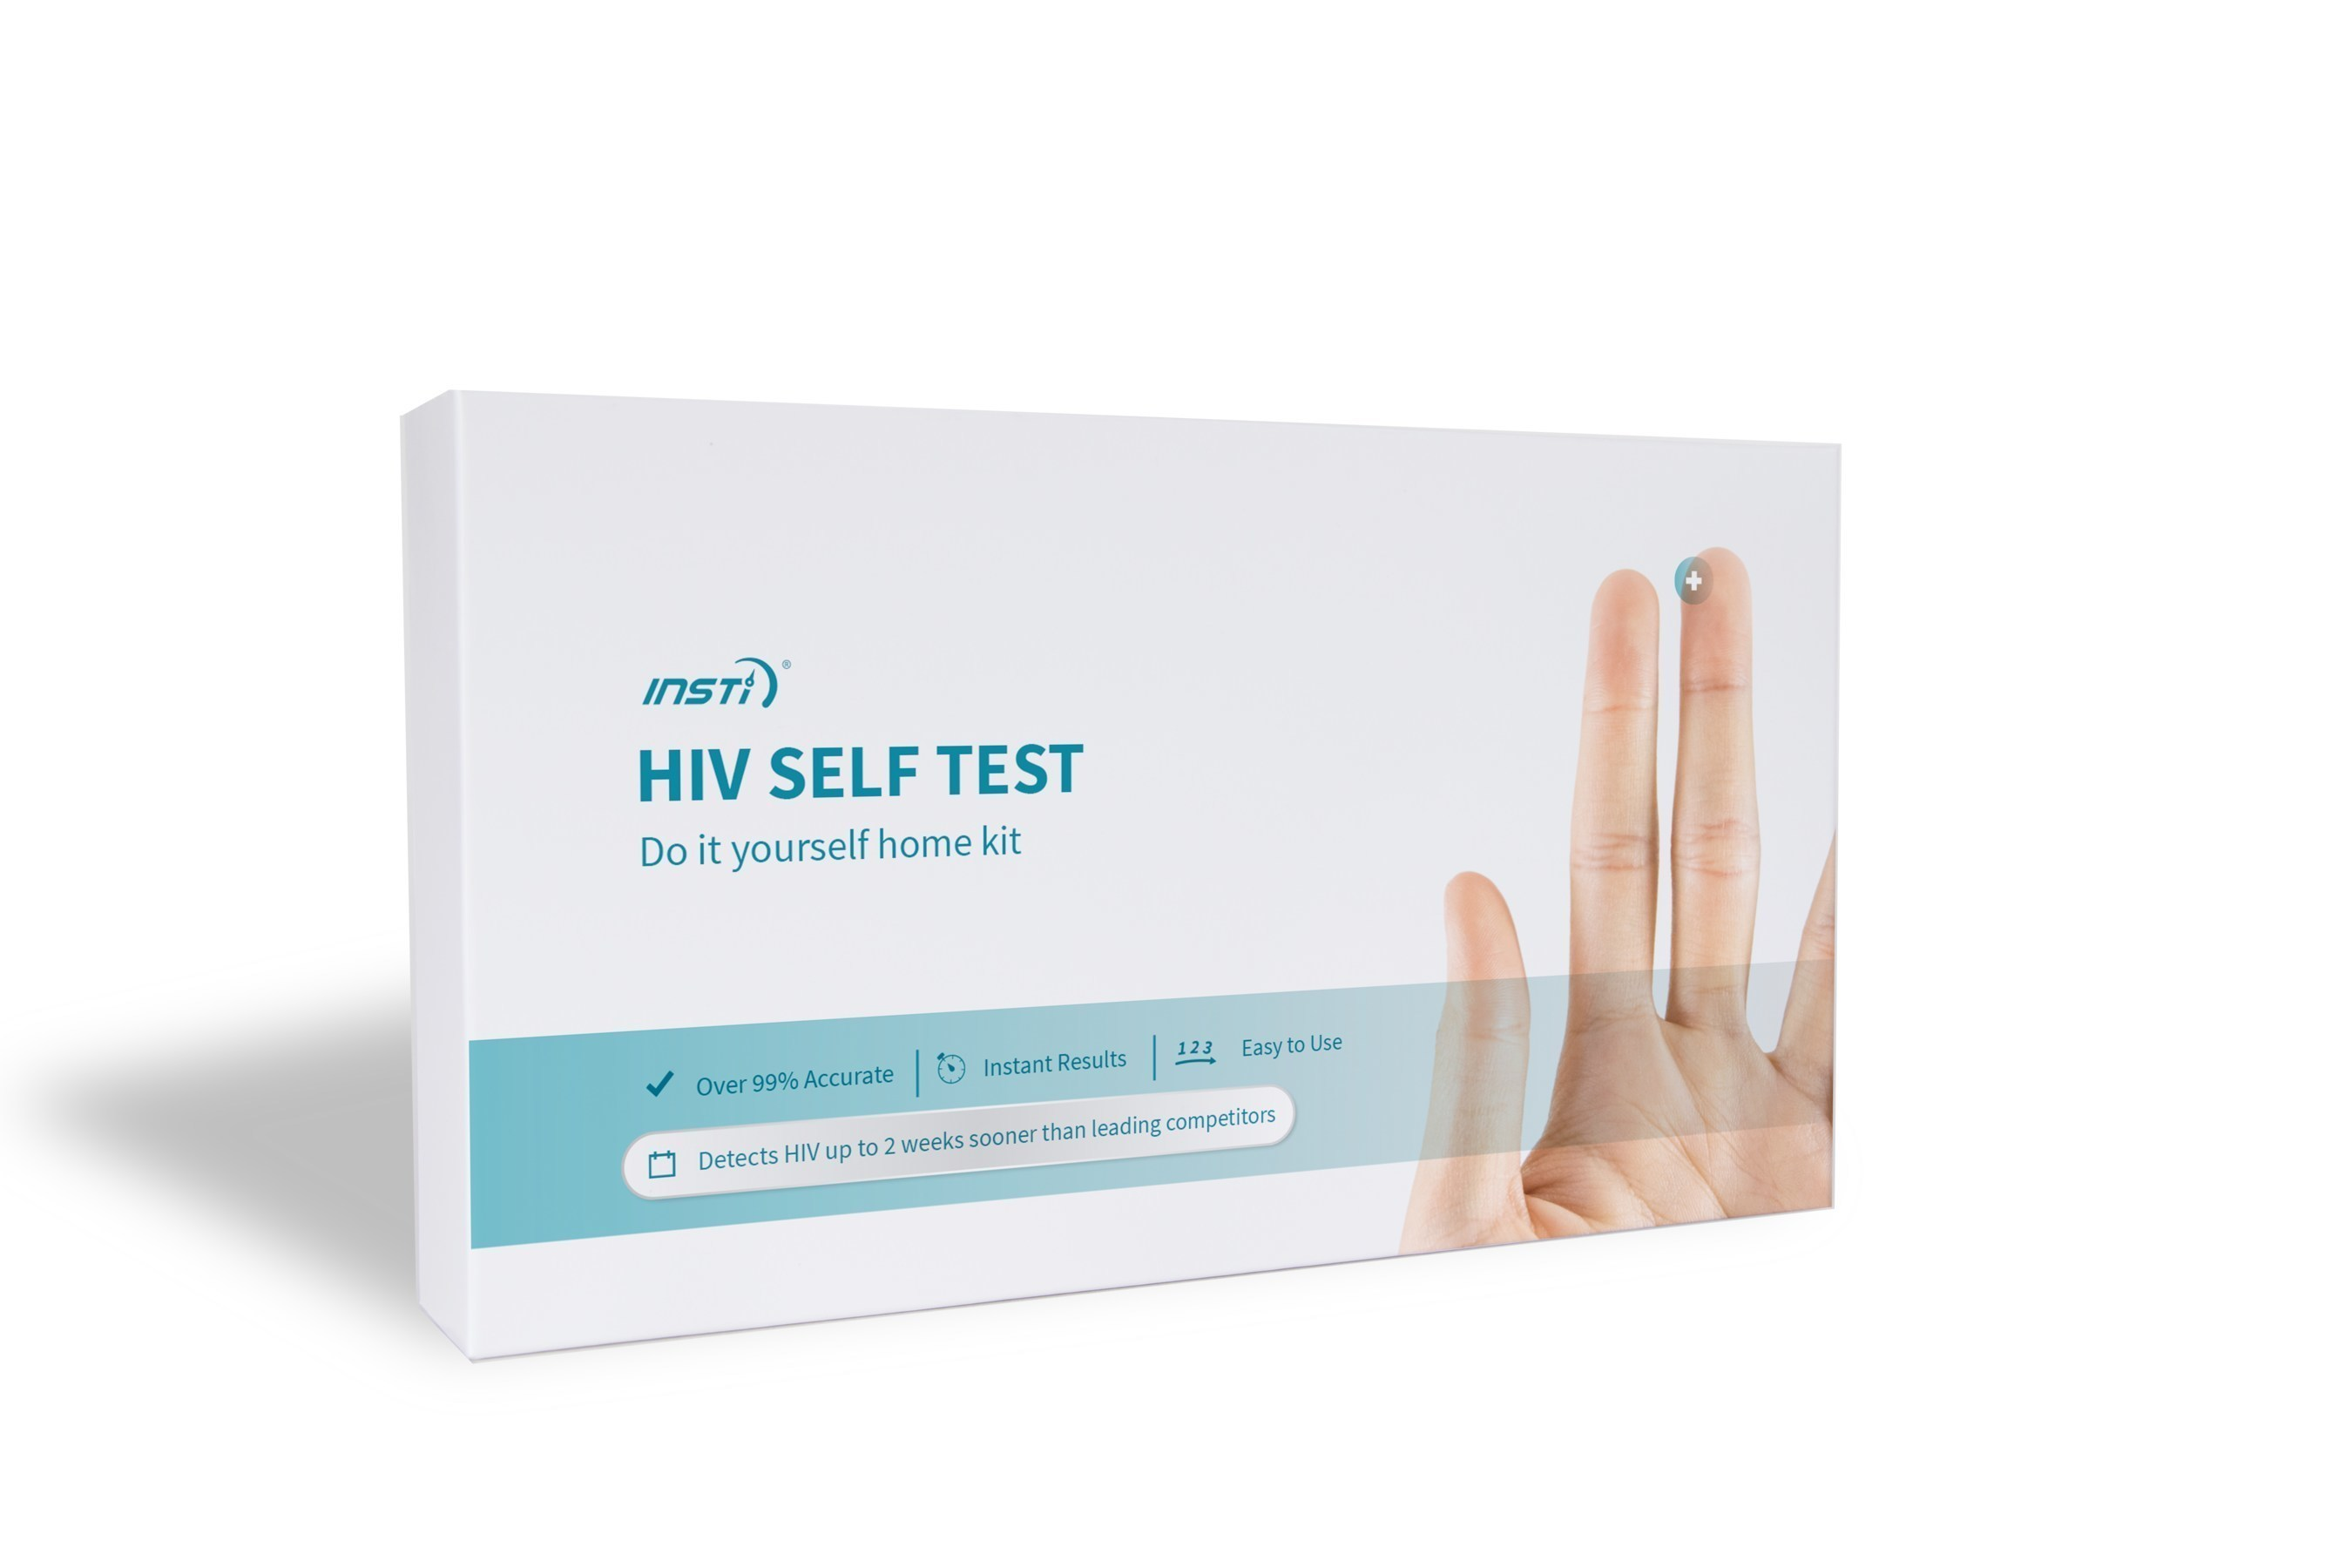 Biolytical receives ce mark for hiv self testing kit solutioingenieria Choice Image